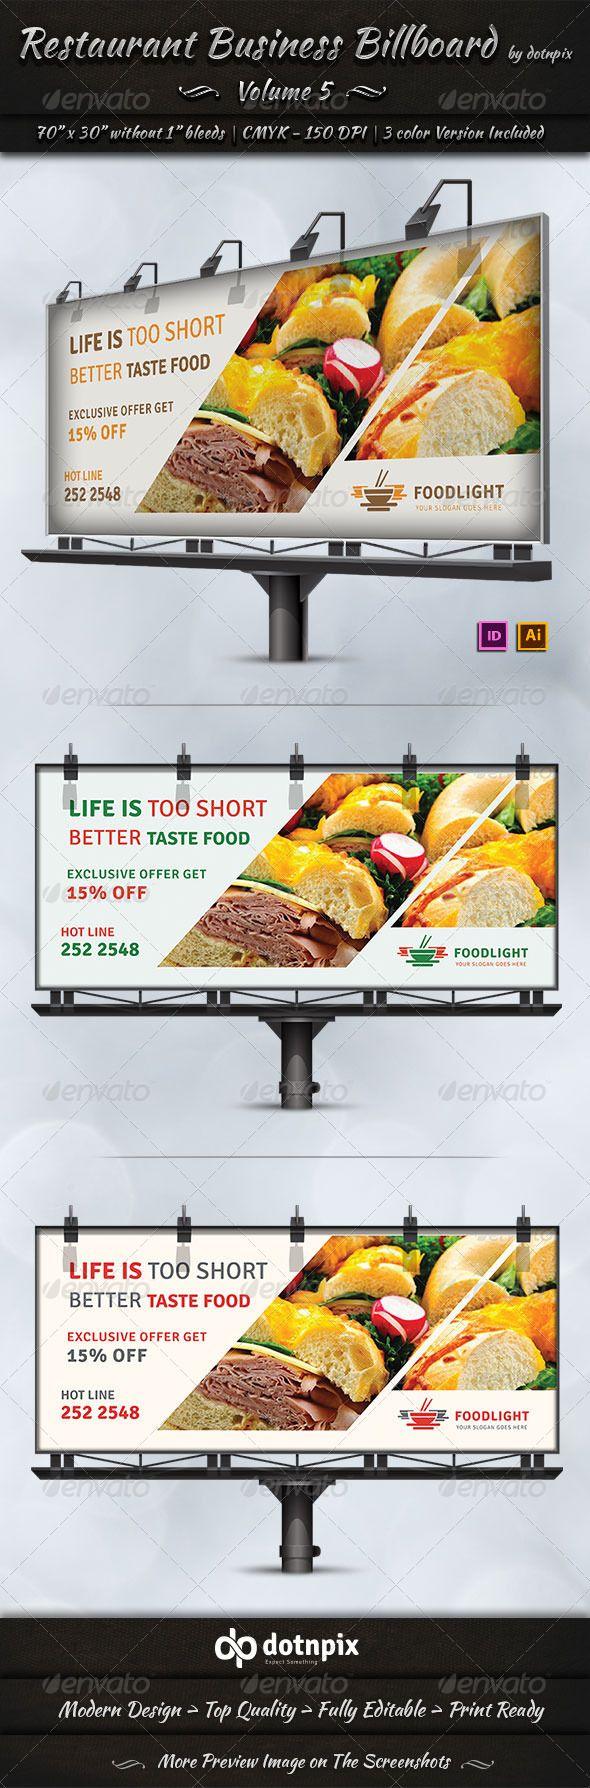 Restaurant Business Billboard Template #design #ads Download: http://graphicriver.net/item/restaurant-business-billboard-volume-5/7577798?ref=ksioks